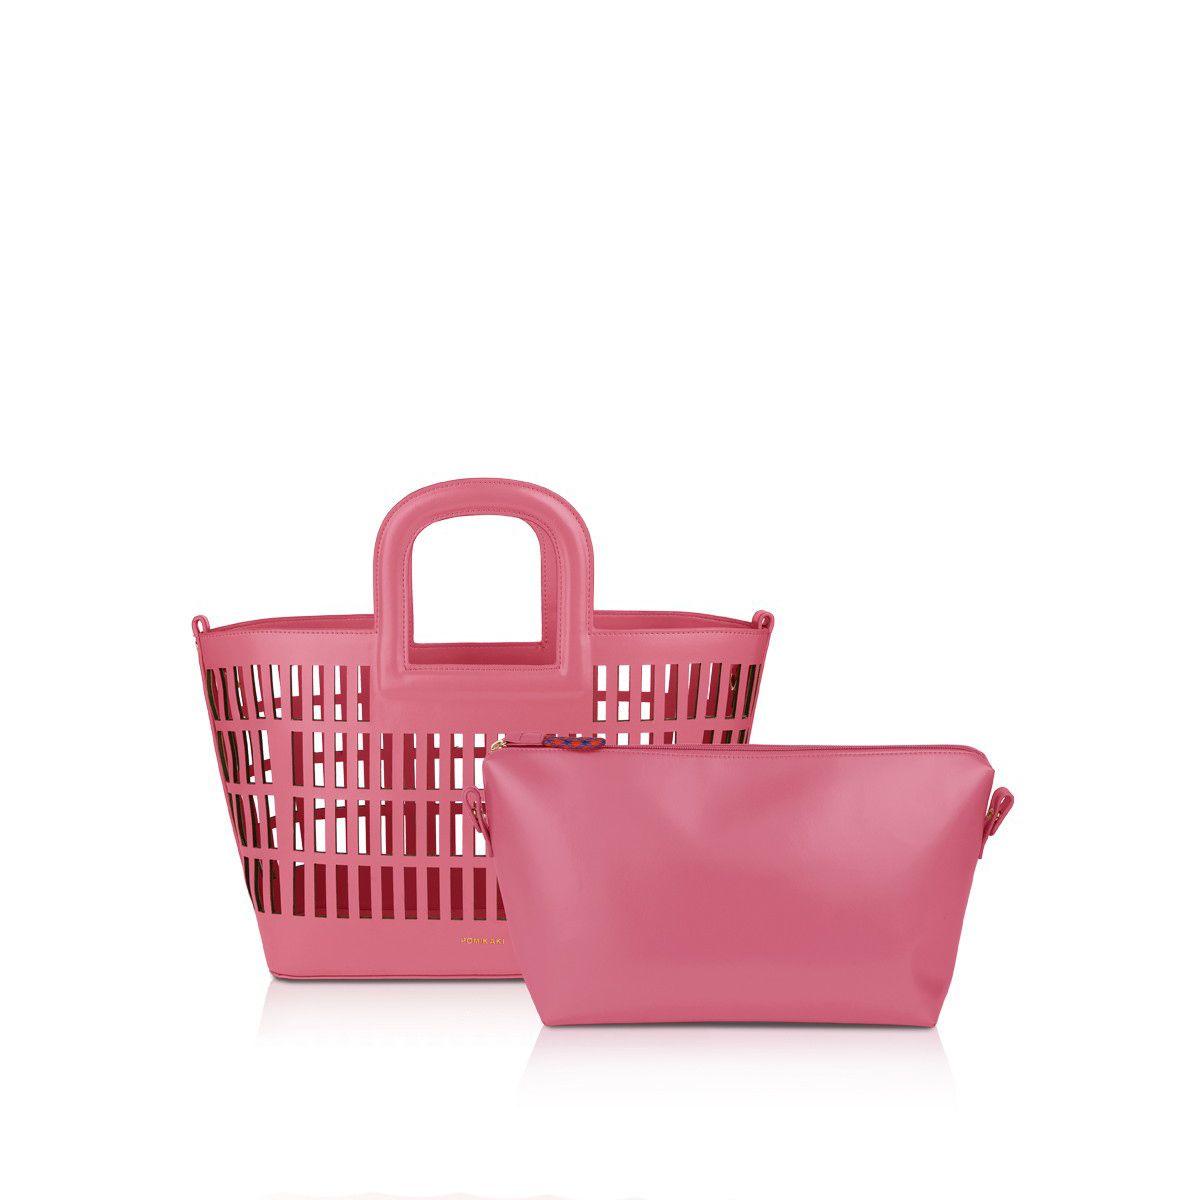 Shopper Kirigami Pomikaki DARK PINK